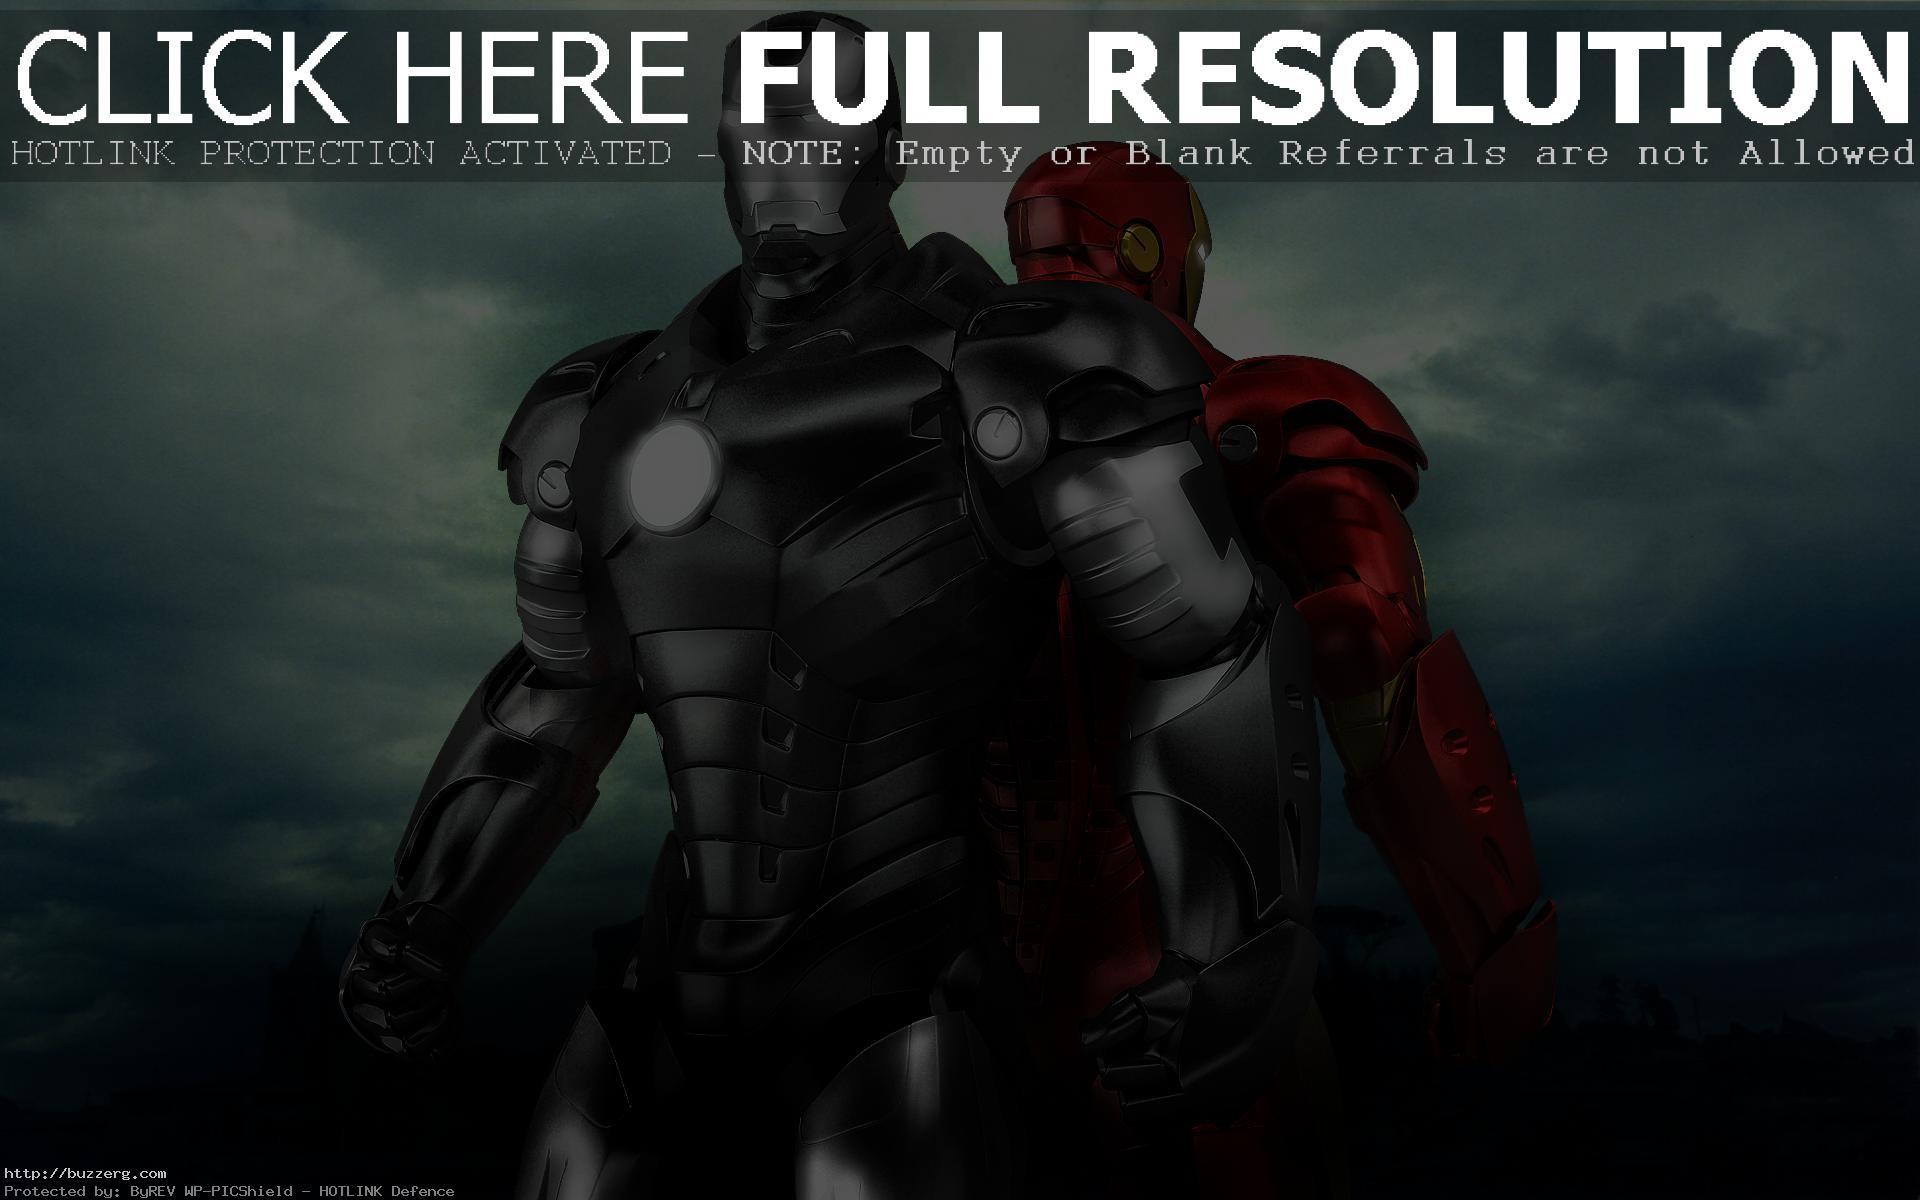 Iron Man War Machine (id: 76763)